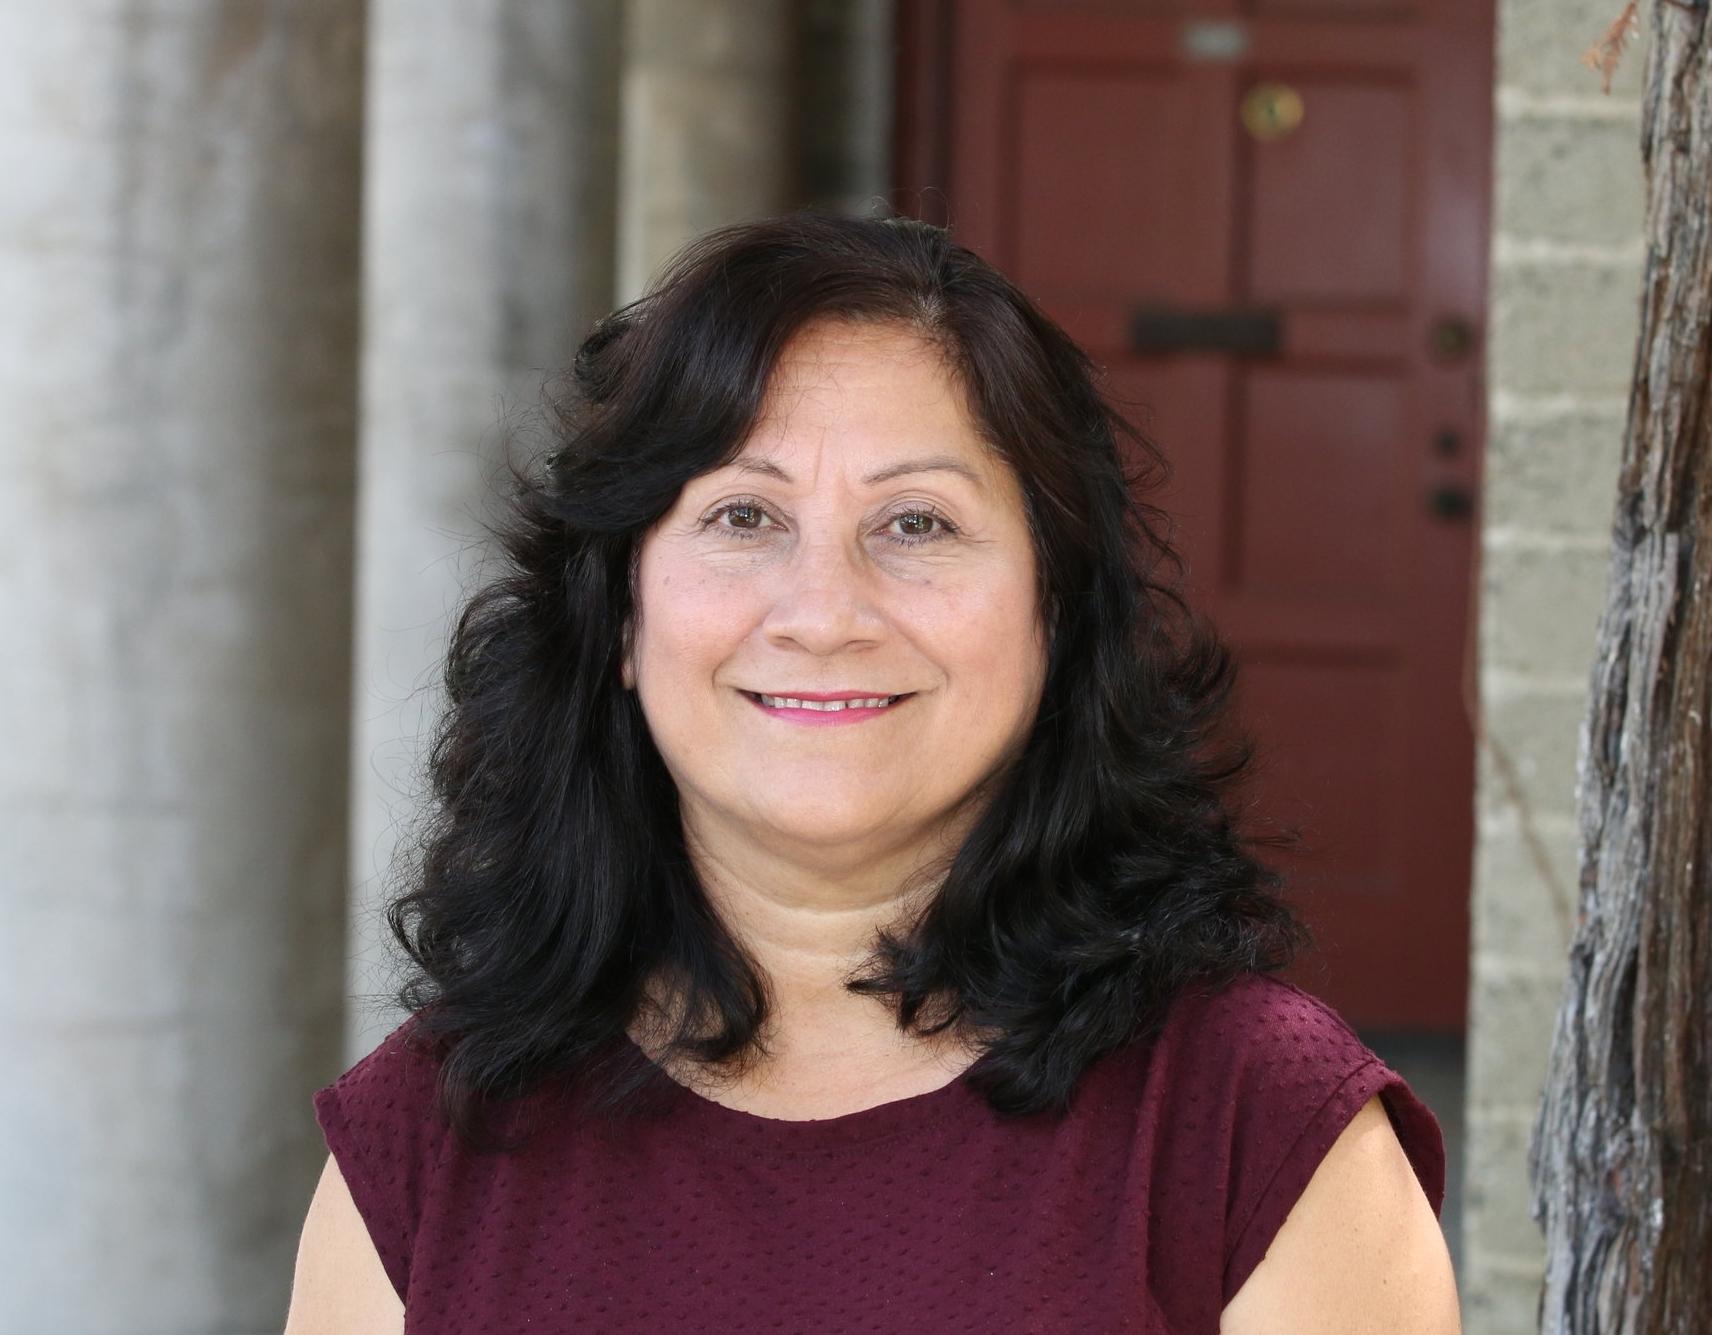 Irene Sias, Book Keeper/Accounting